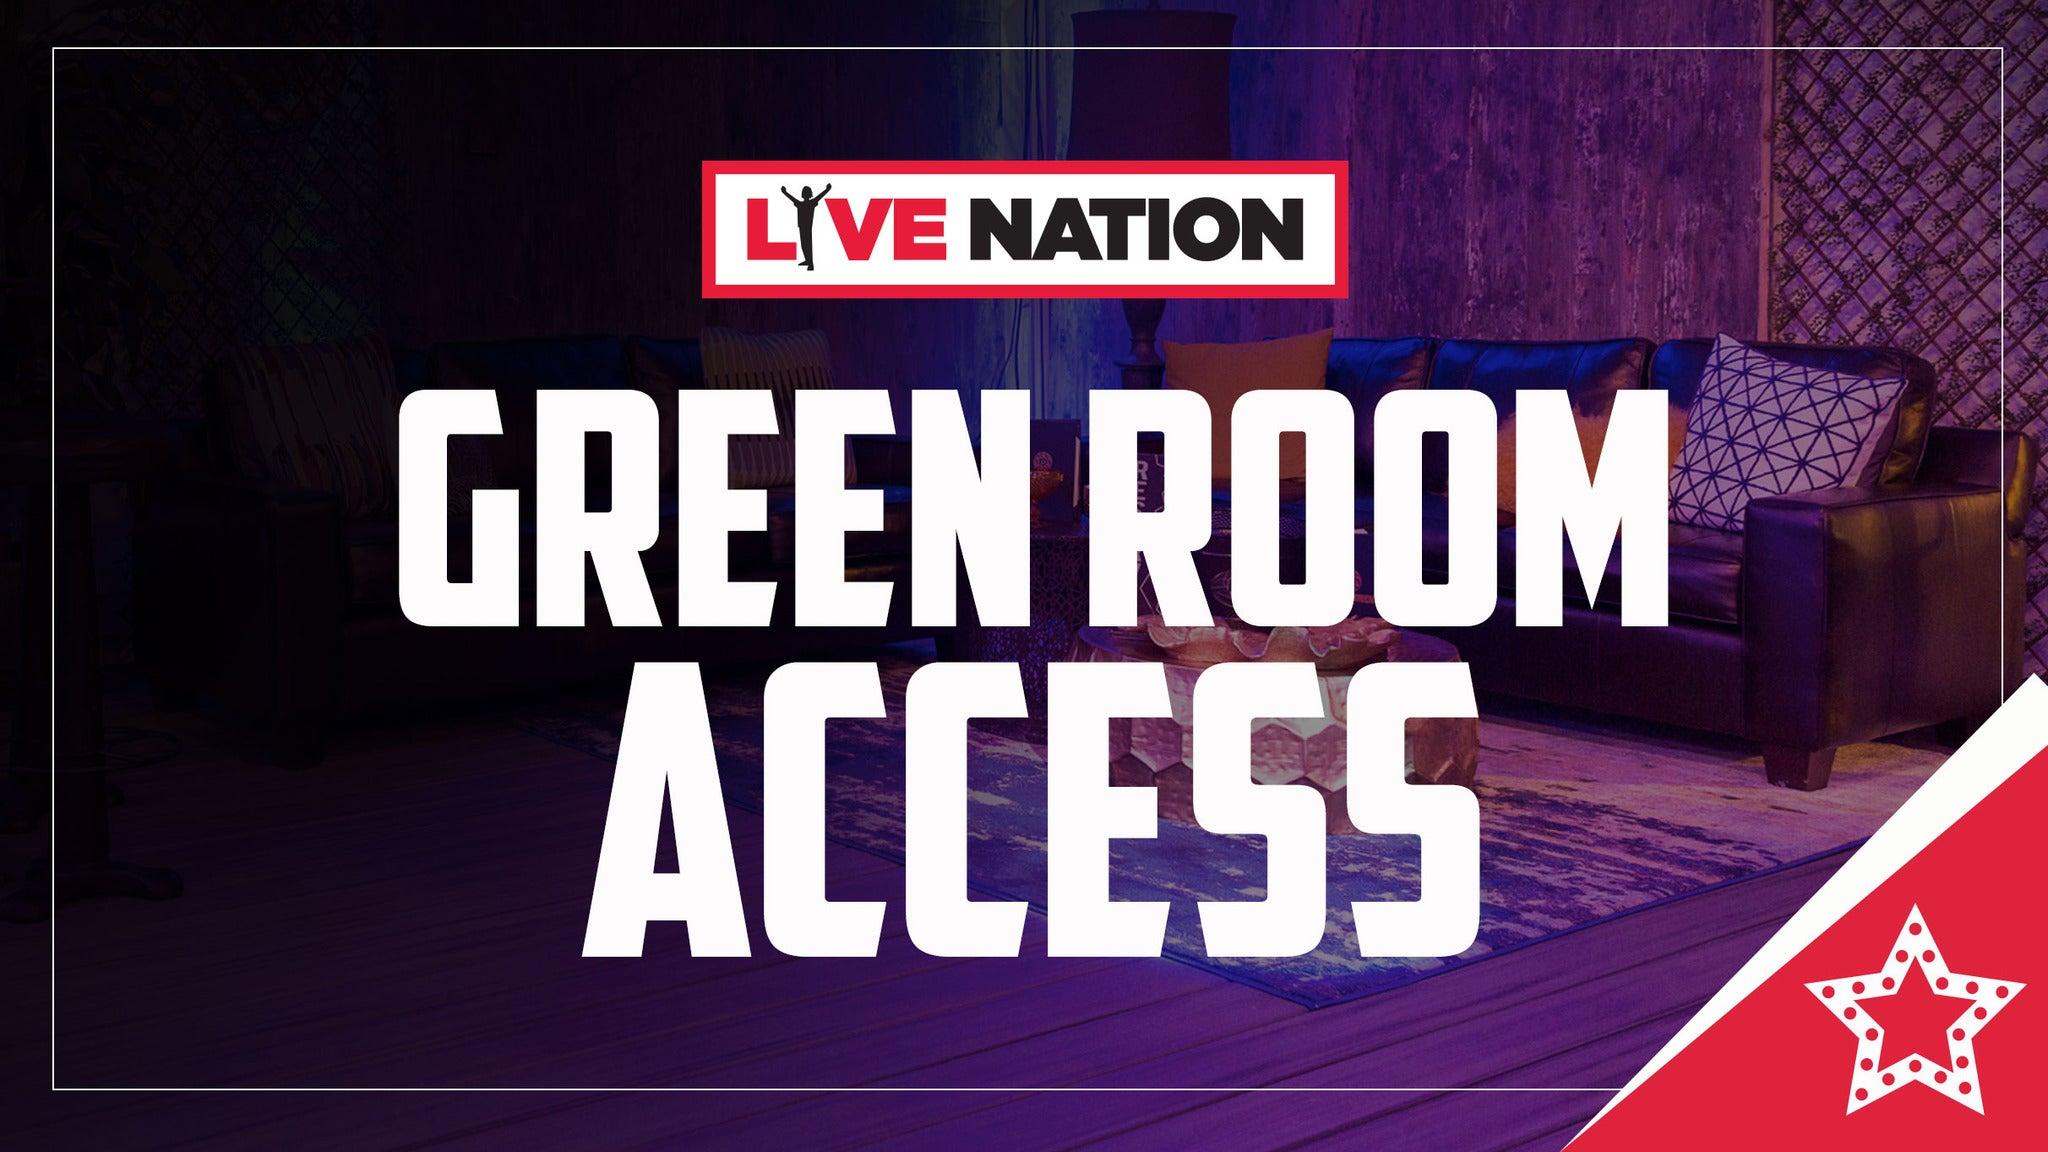 HCA-STL Green Room Access : 3 Doors Down & Collective Soul